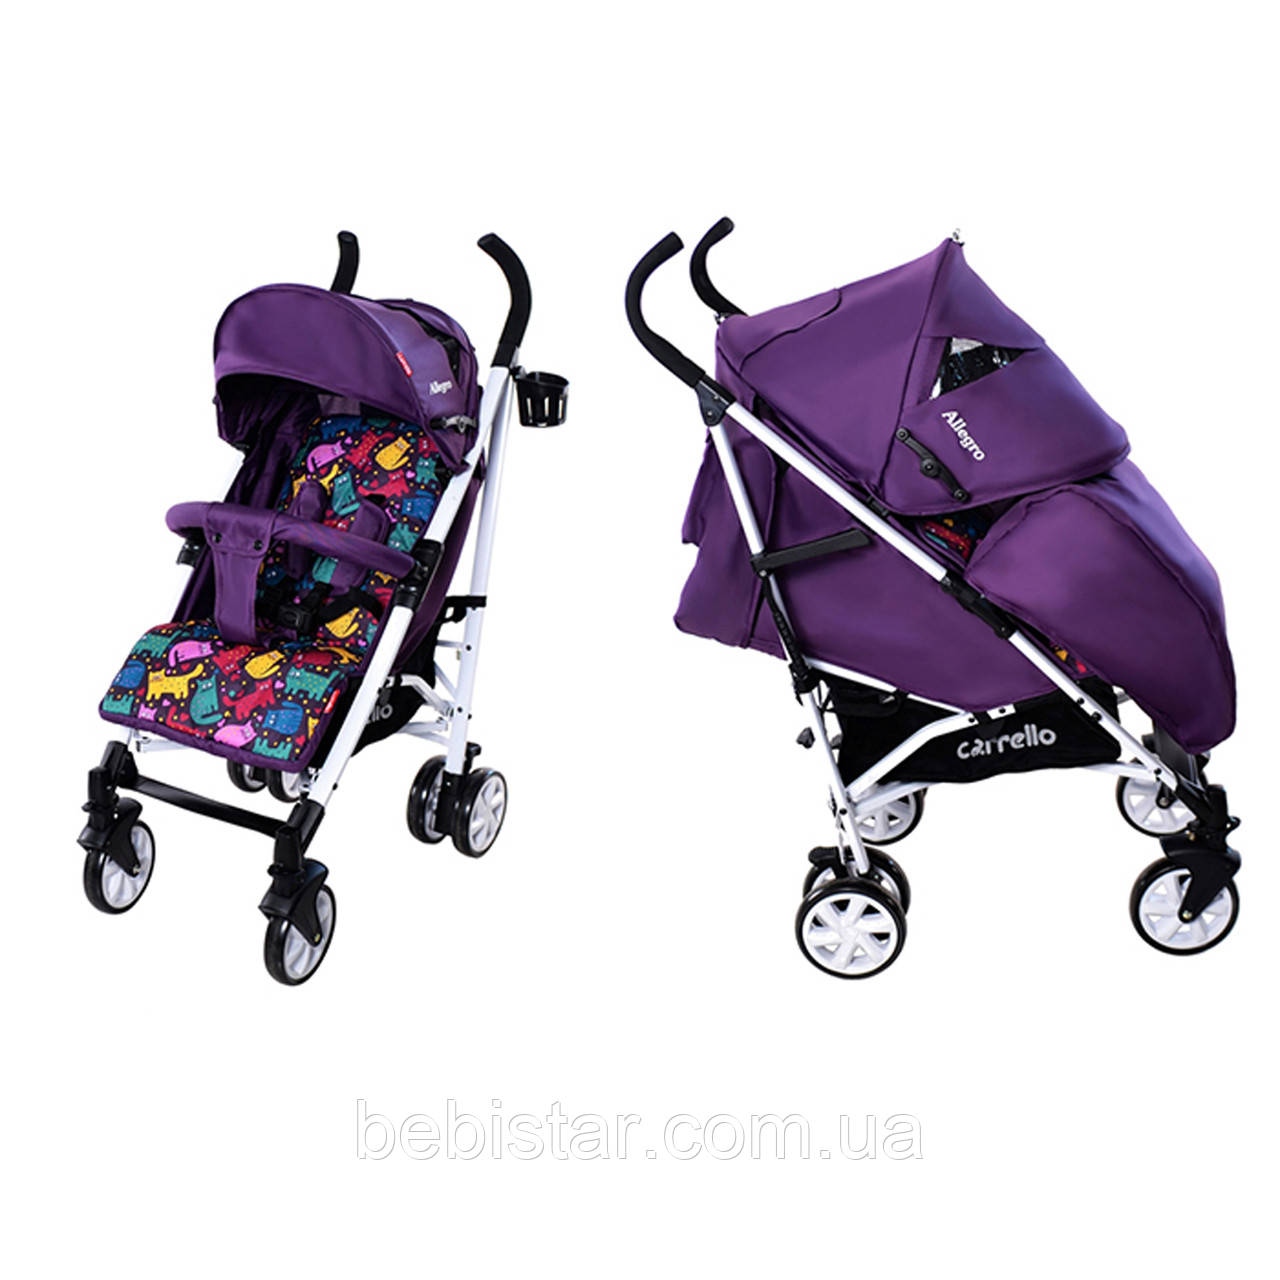 Детская коляска-трость CARRELLO Allegro CRL-10101 Kitty Purple